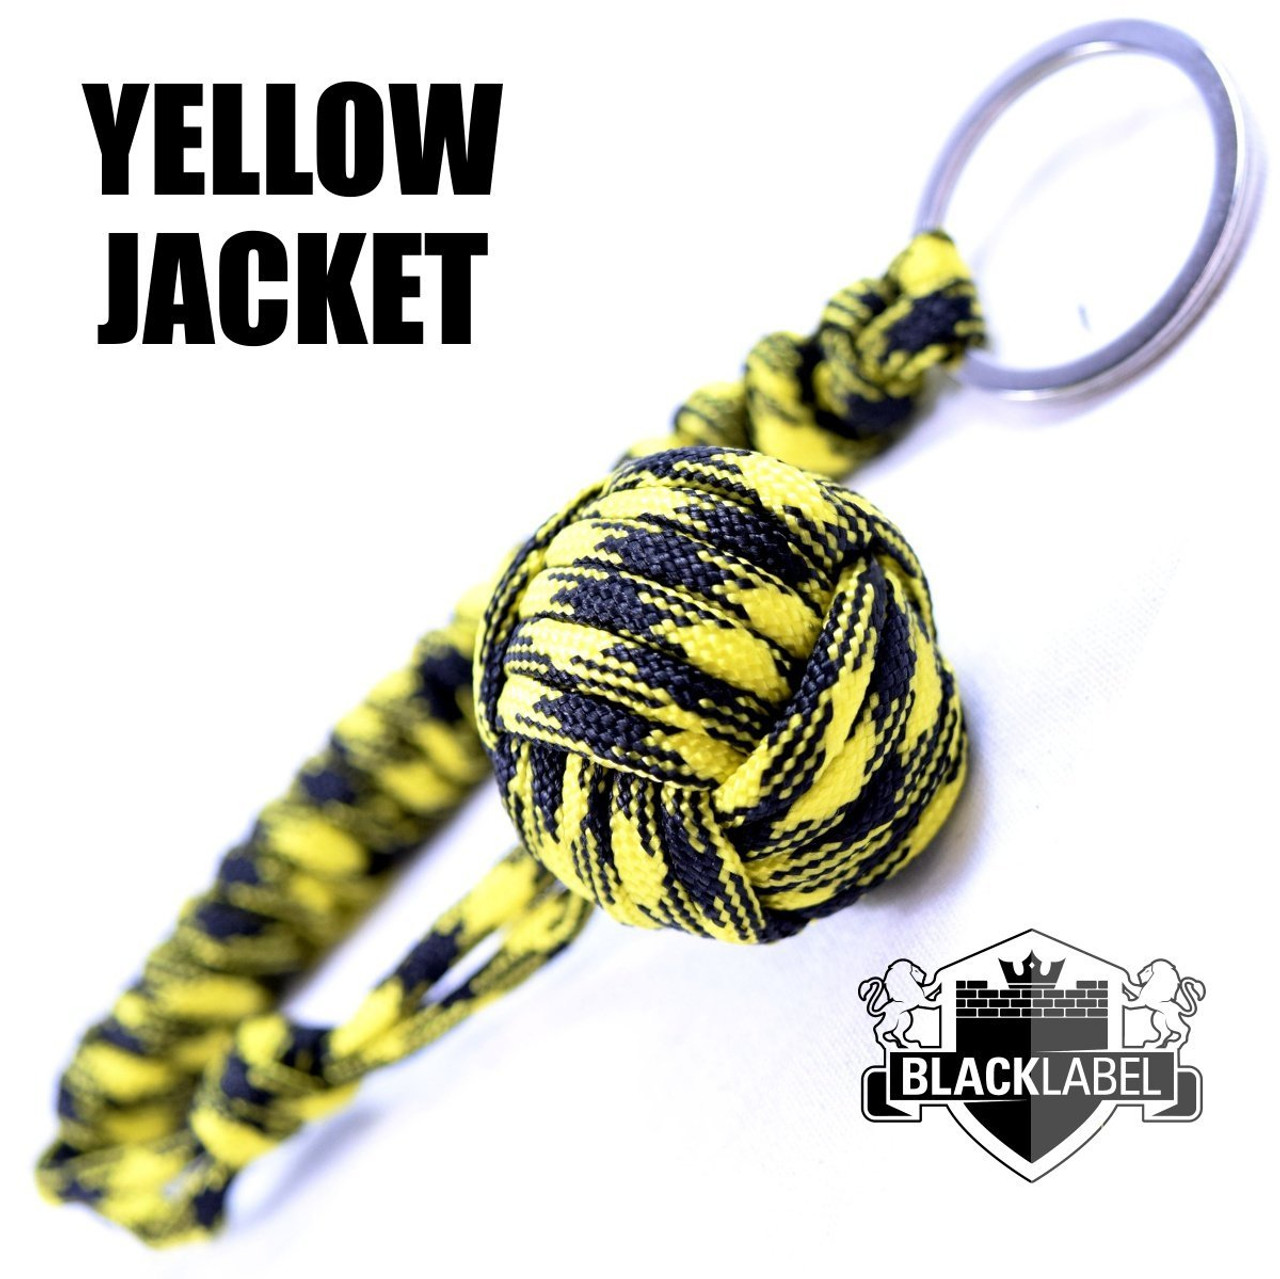 best loved 2cb7b 8ca7e Pit Boss Self Defense Keychain Ball - Yellow Jacket